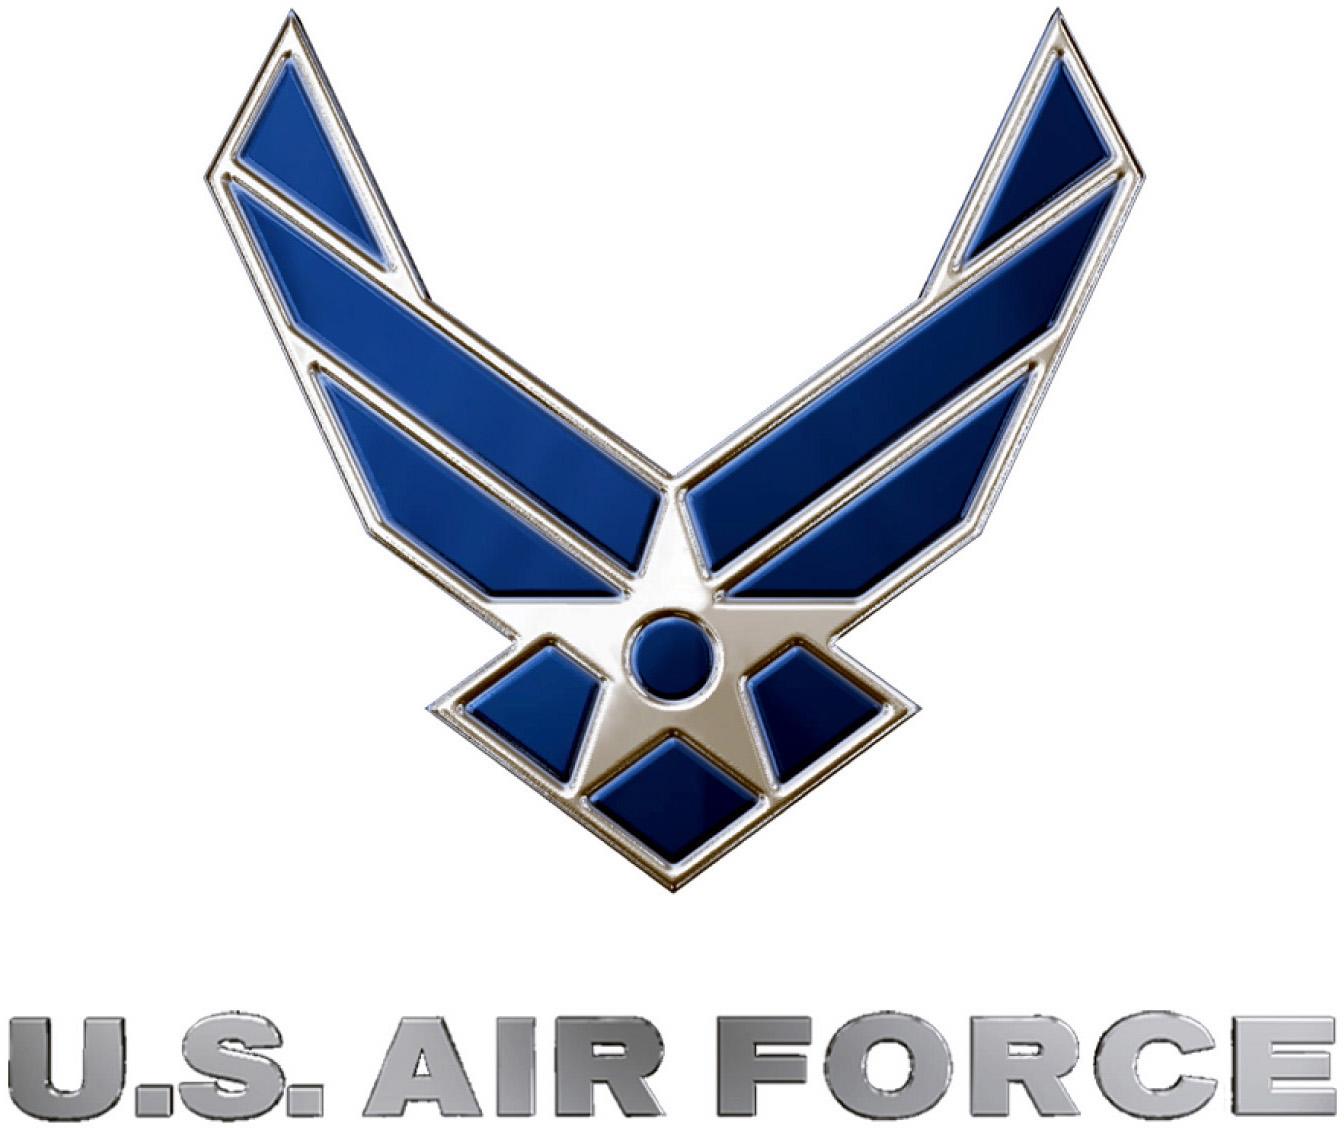 Air force logo Wallpaper